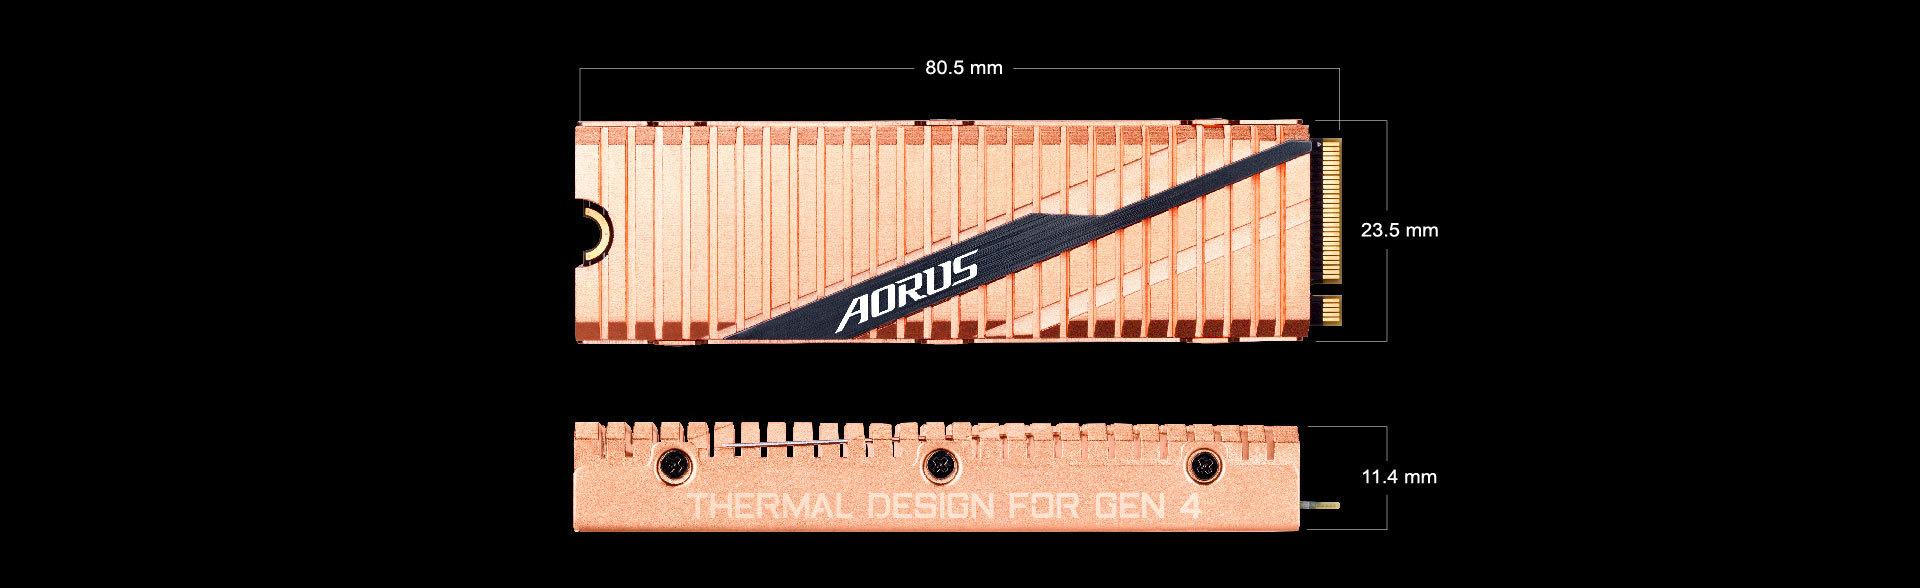 AORUS Gen4 - 500 Go - M.2 2280 - PCI-Express 4.0 x4, NVMe 1.3